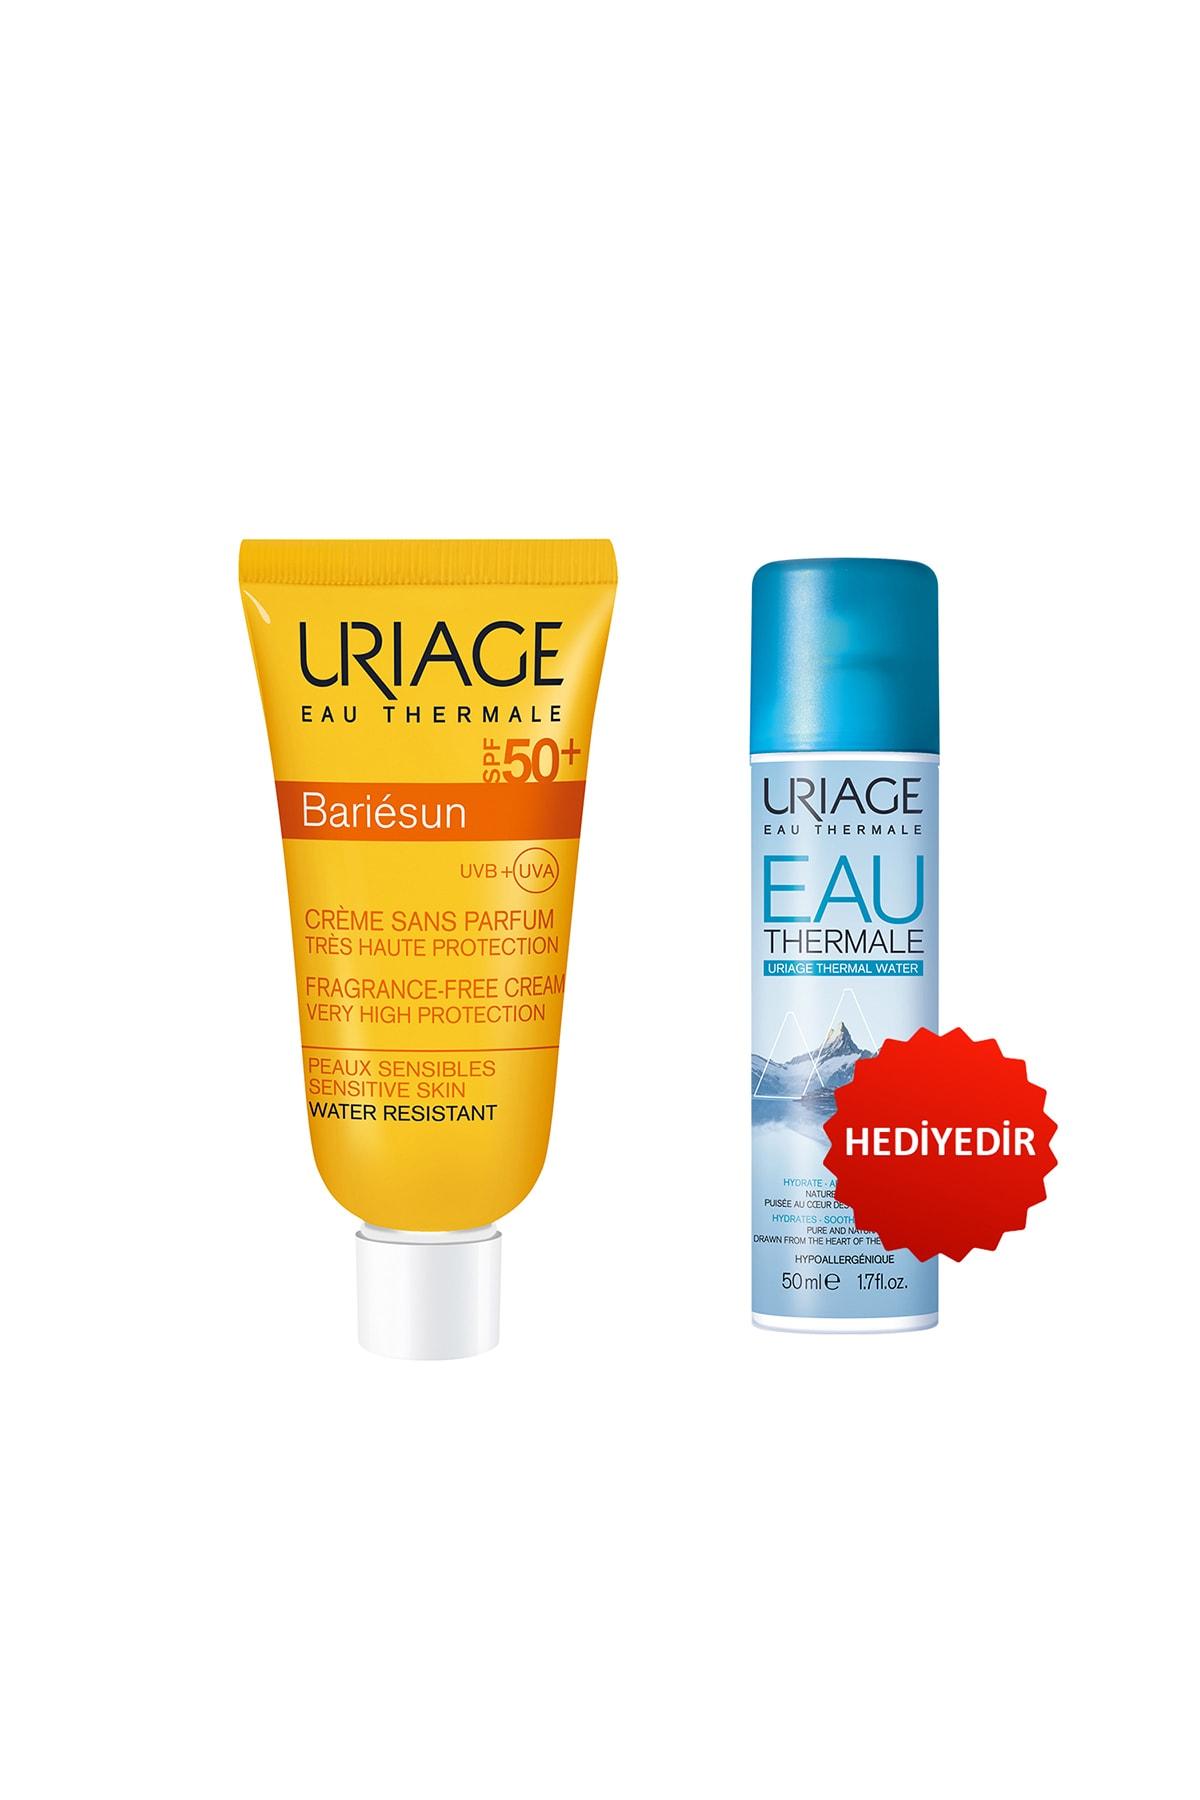 Uriage Bariésun Spf50+ Cr Ss Parf T 50 ml (Parfüm İçermeyen Güneş Kremi) + Eau Thermale D Uriage Sp 50 ml